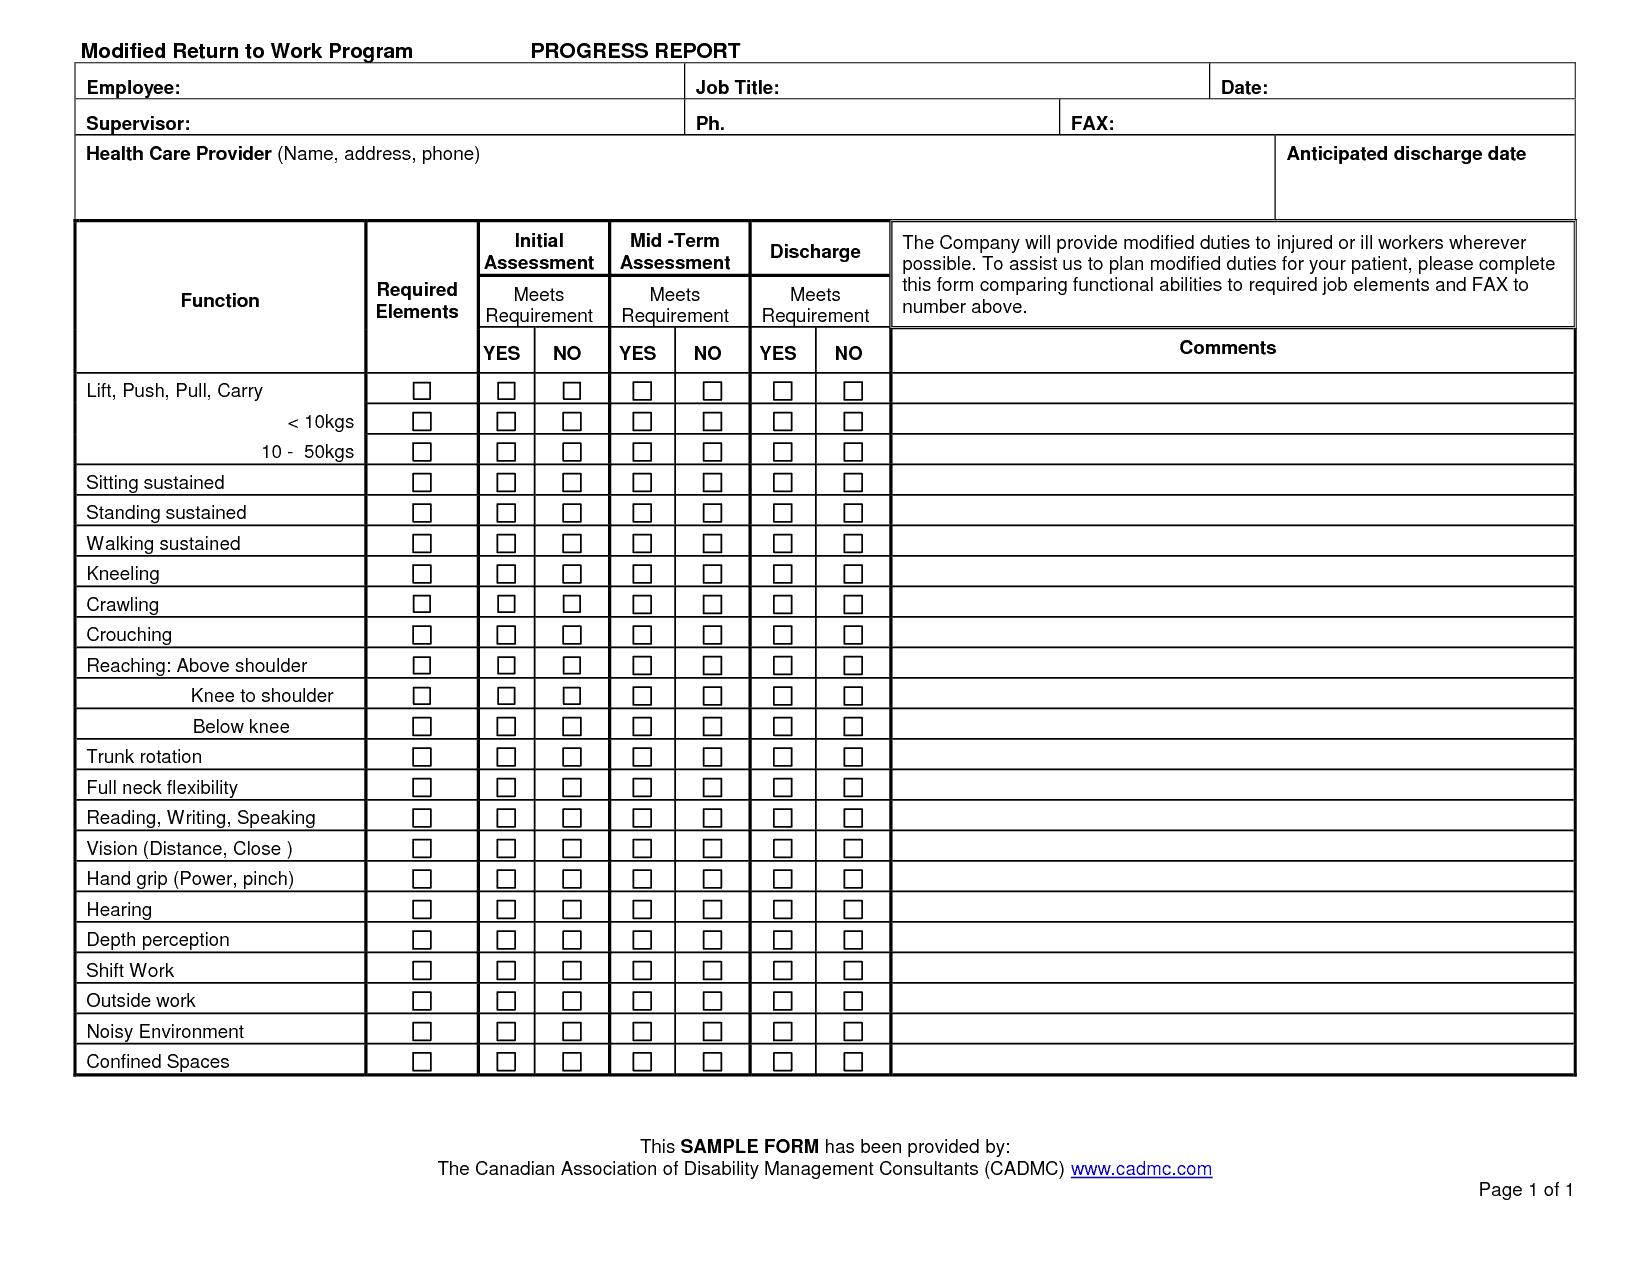 progress report sample 13.461